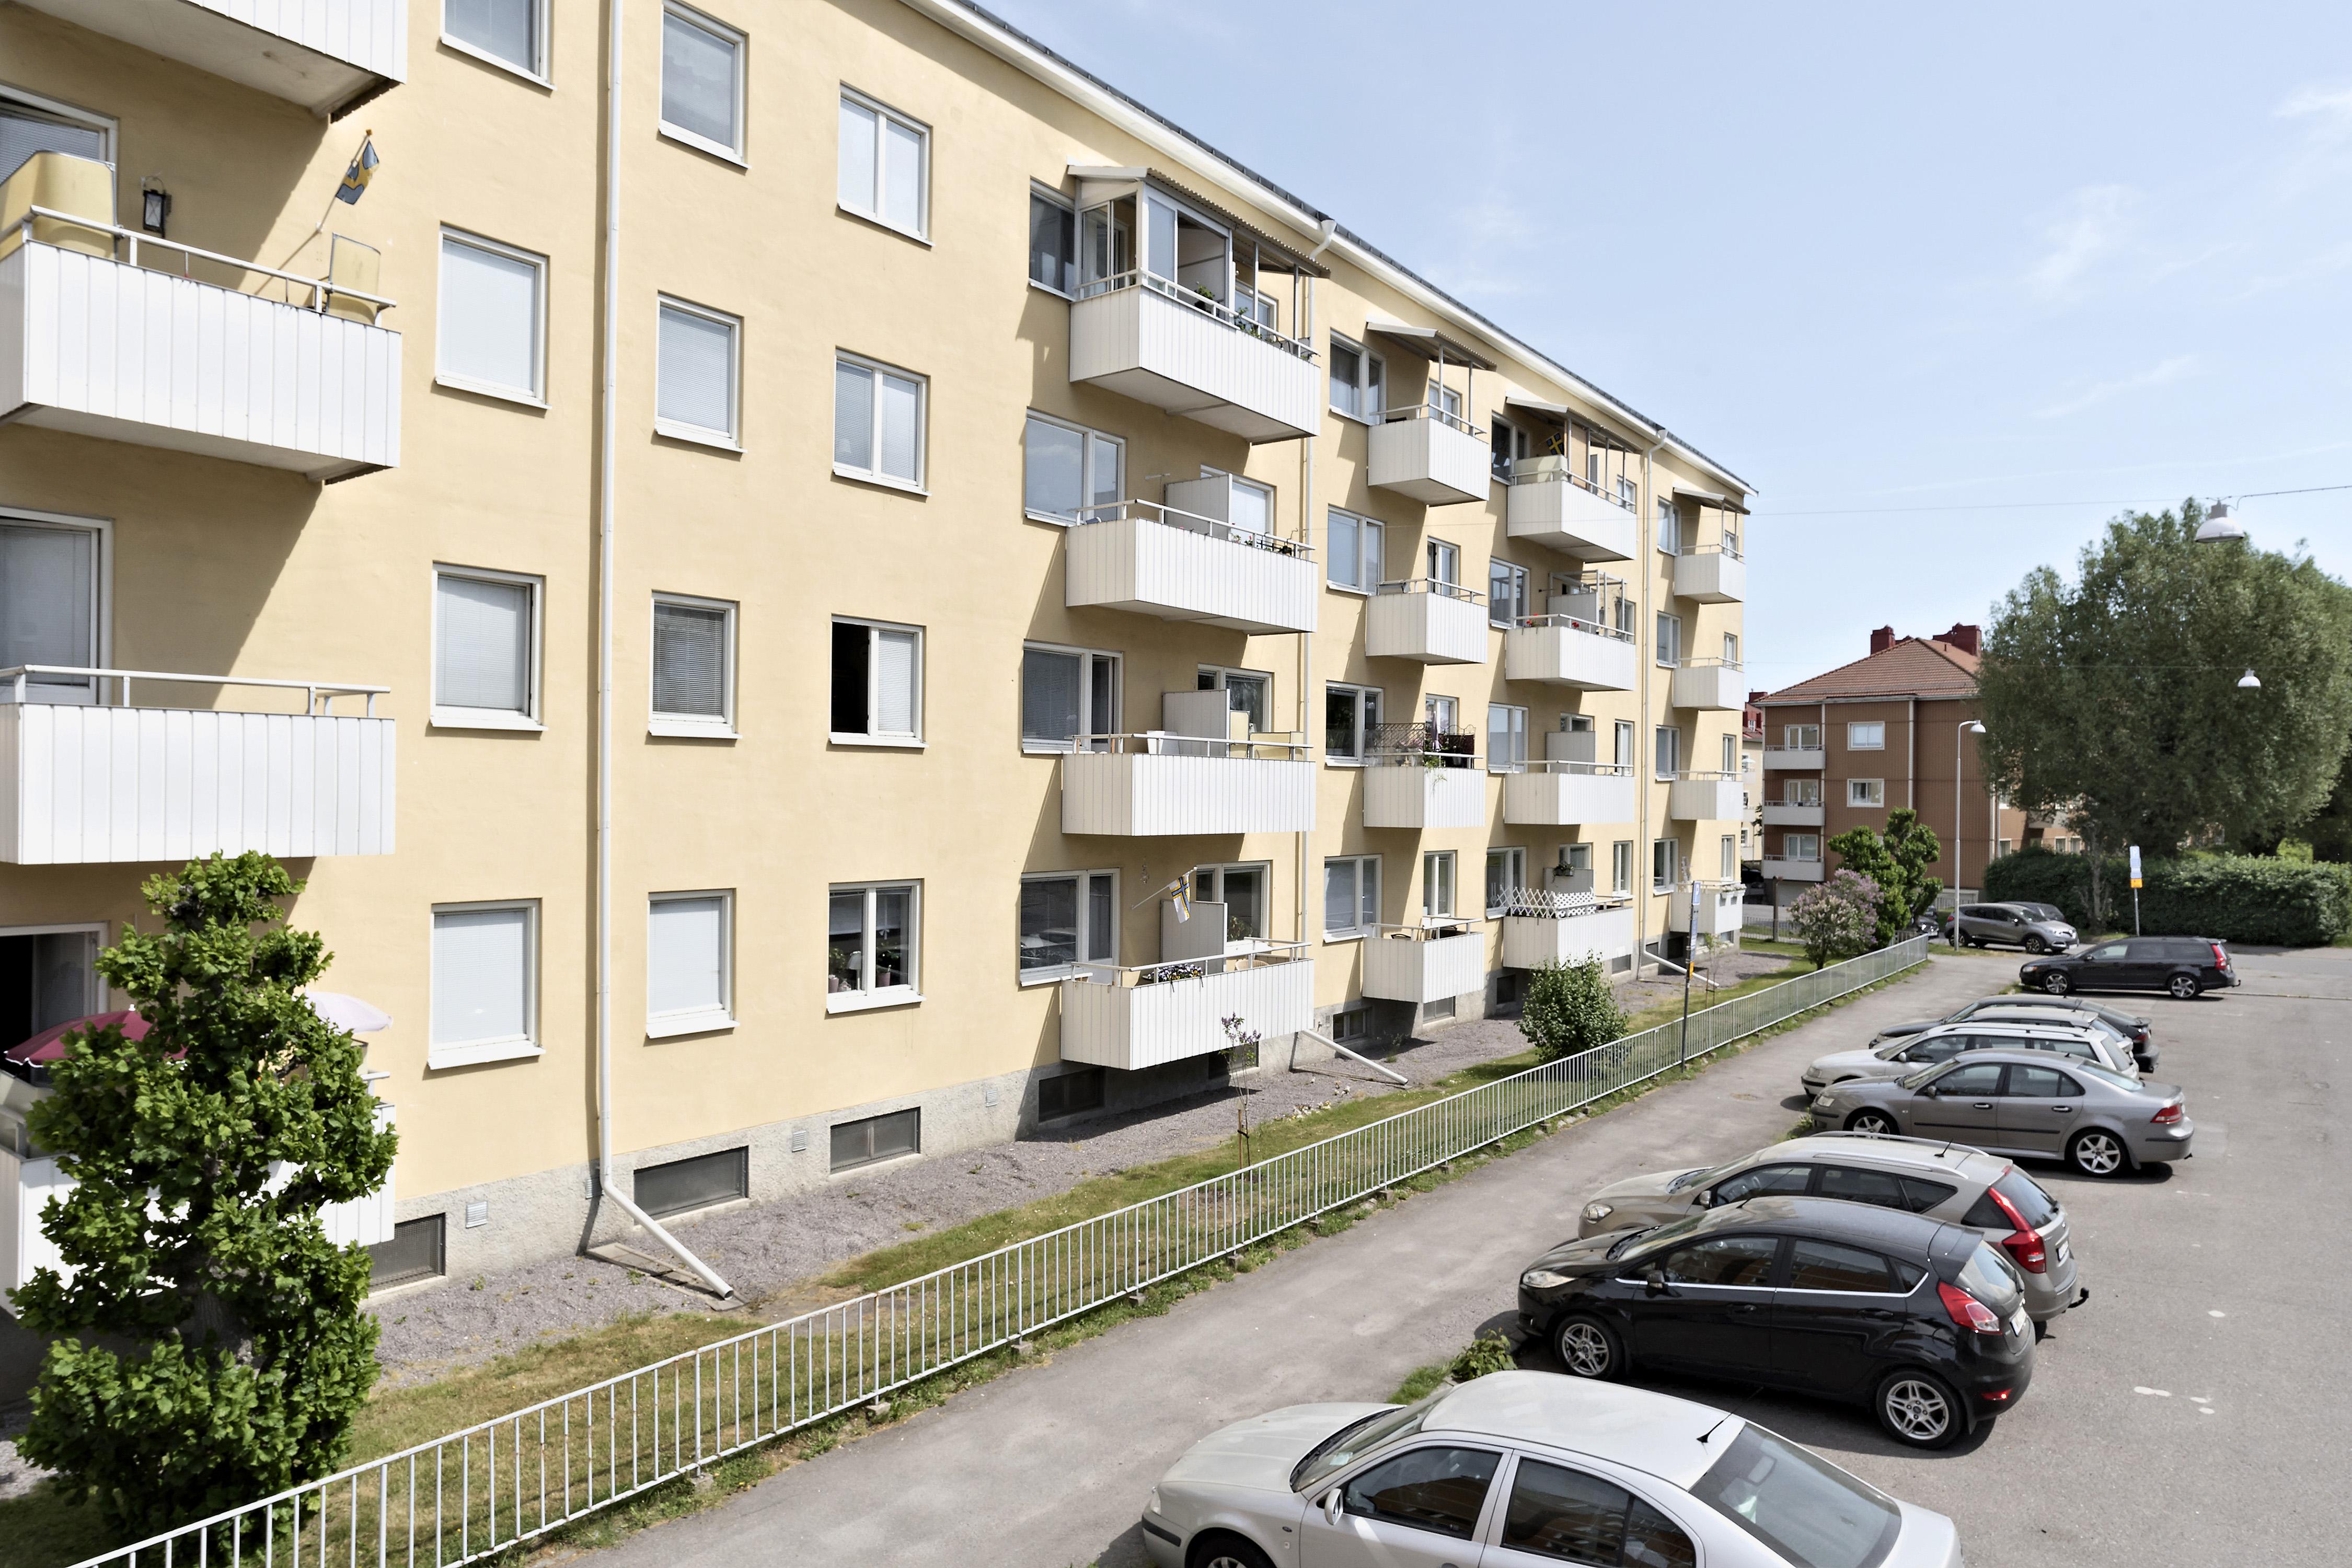 Petter Swarts gatan 15 B | Söder